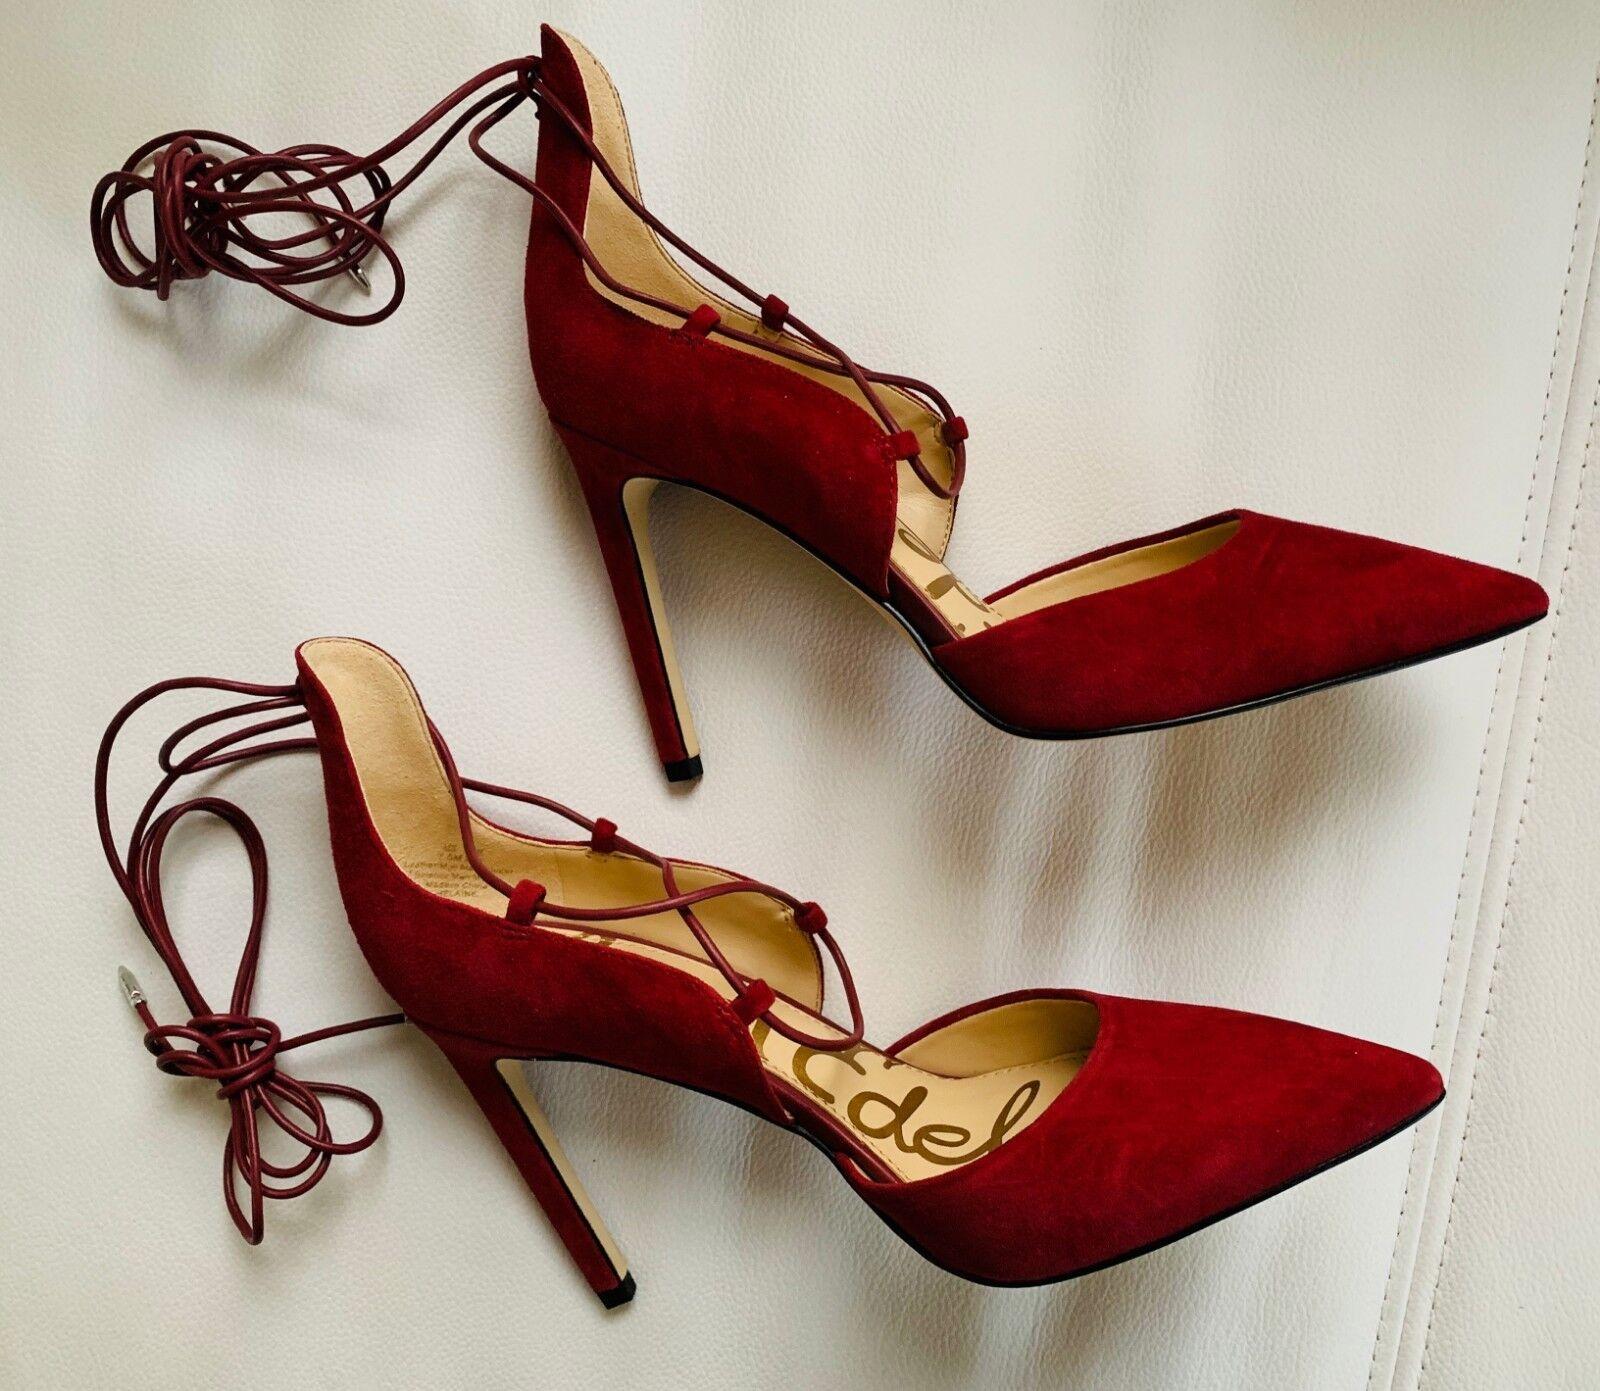 autentico online Sam Edelman donna String Lace-Up Heels scarpe Wine Leather Leather Leather Suede 7.5 Medium  in vendita online